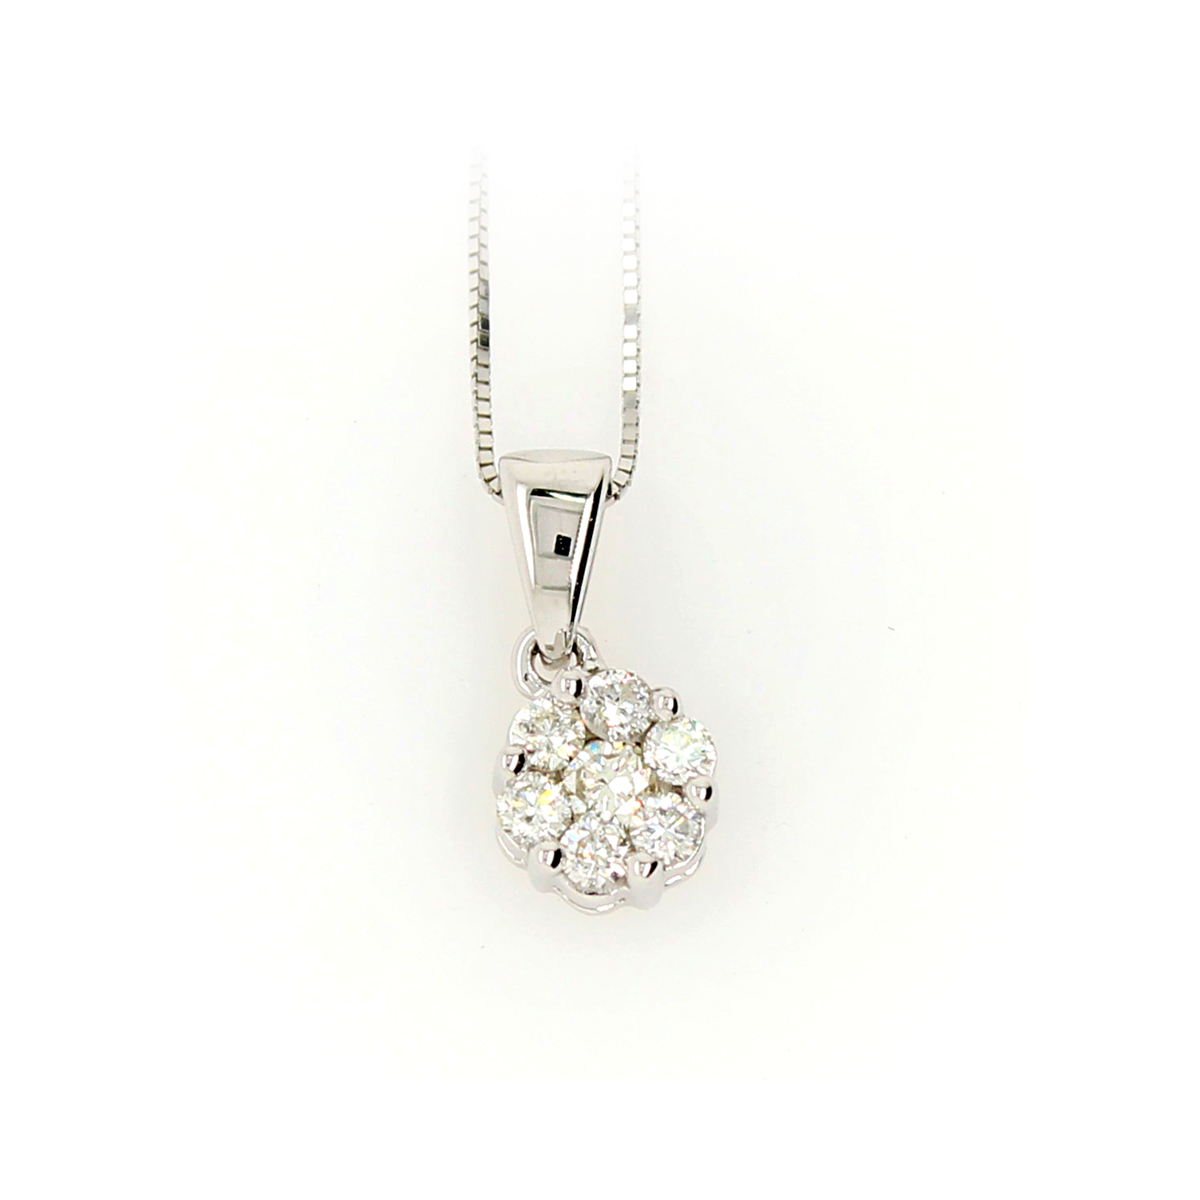 Shefi Diamonds 10 Karat White Gold .2 Carat Cluster Diamond Pendant Necklace